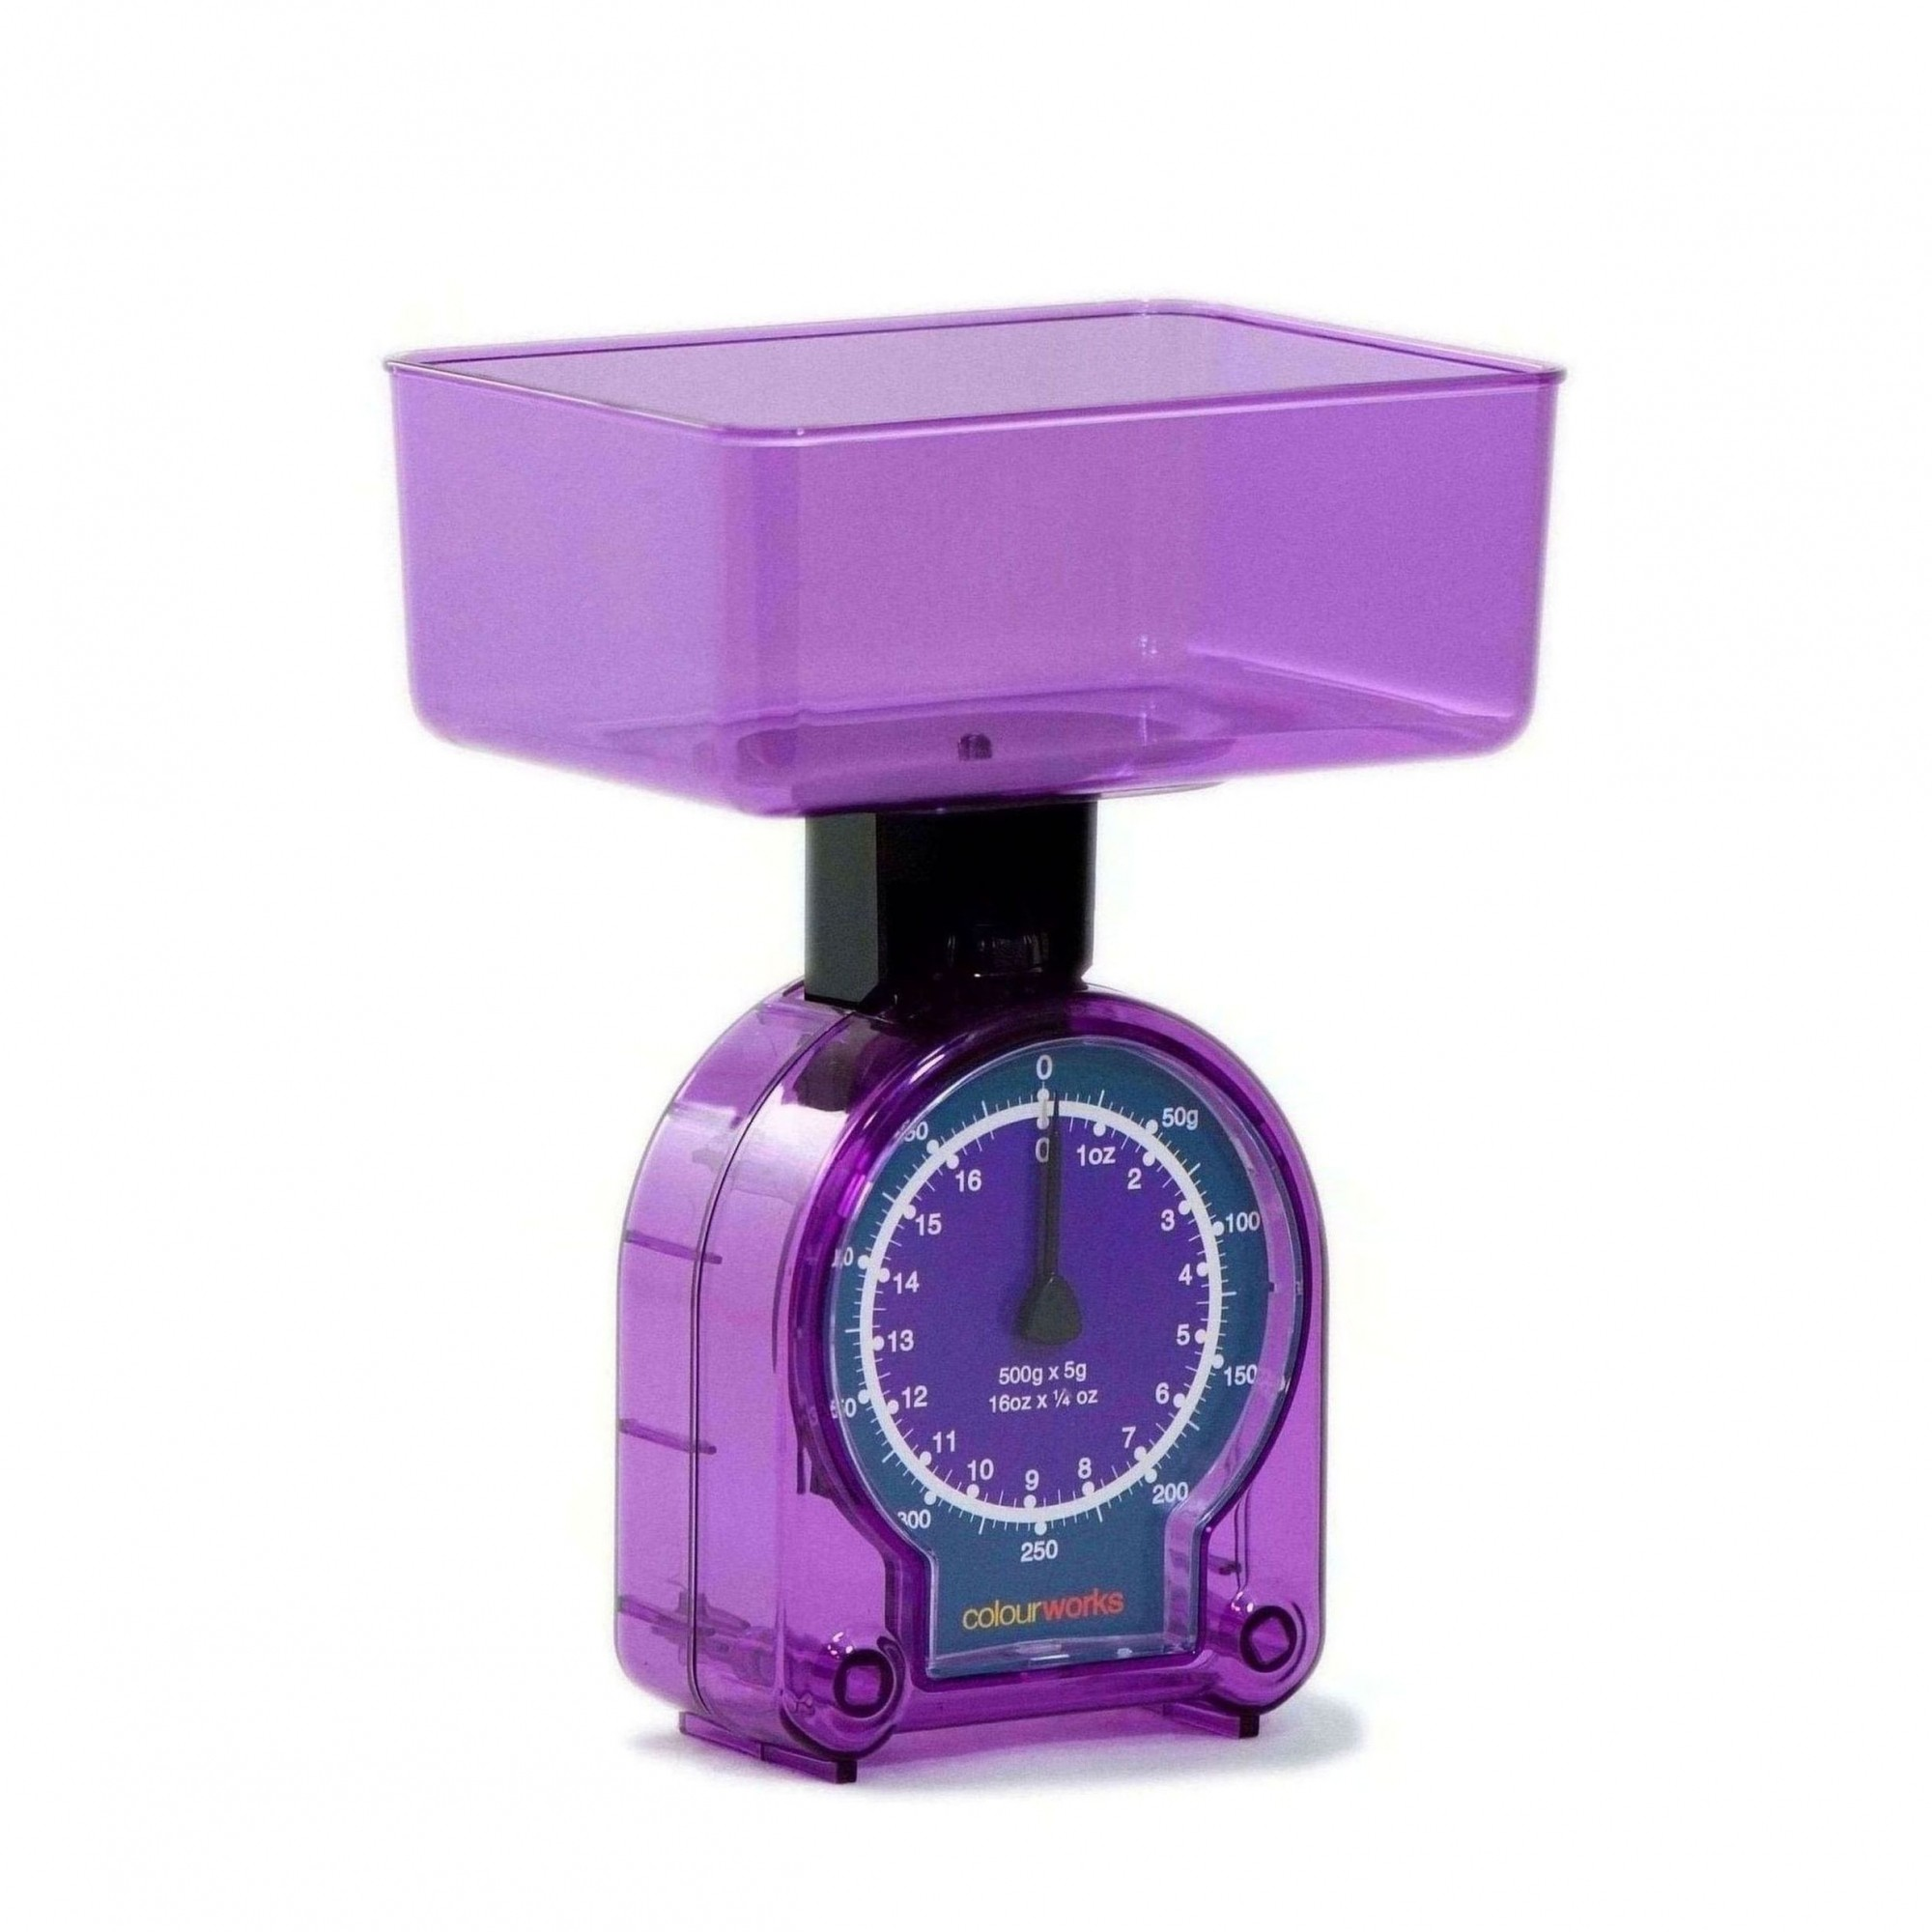 Gs - K. Craft colourwor balanca 500g acrilico